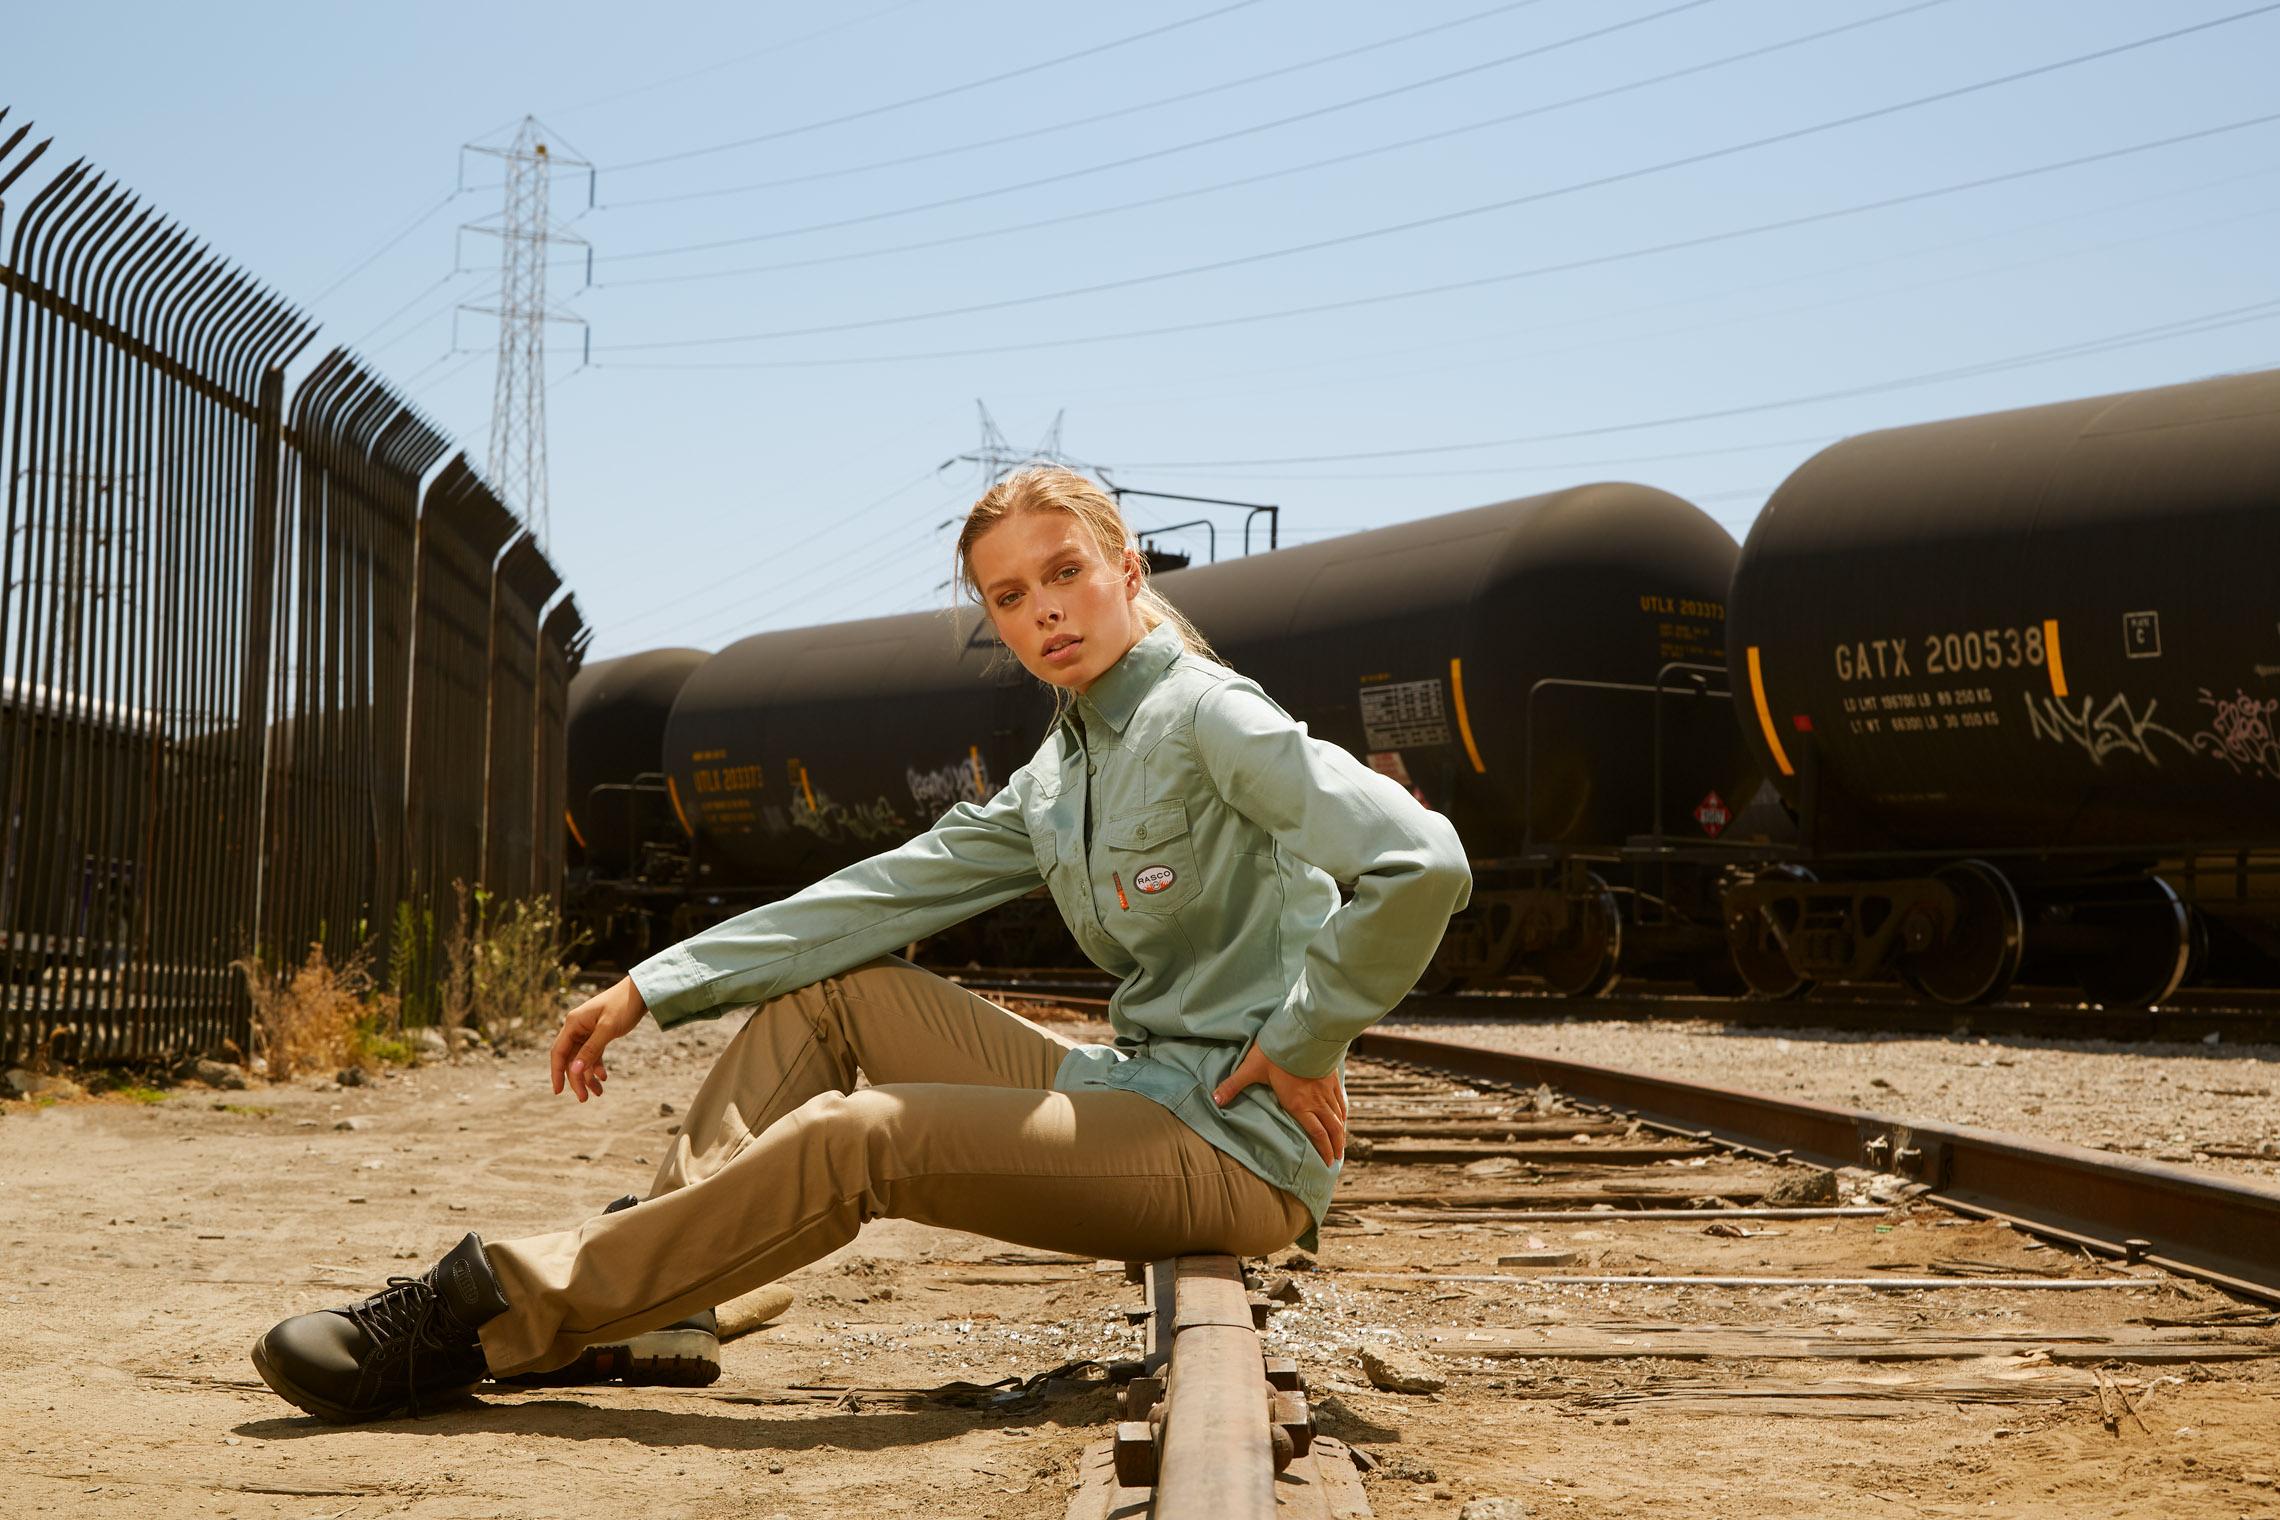 girl in work clothes takes break at railt racks during work